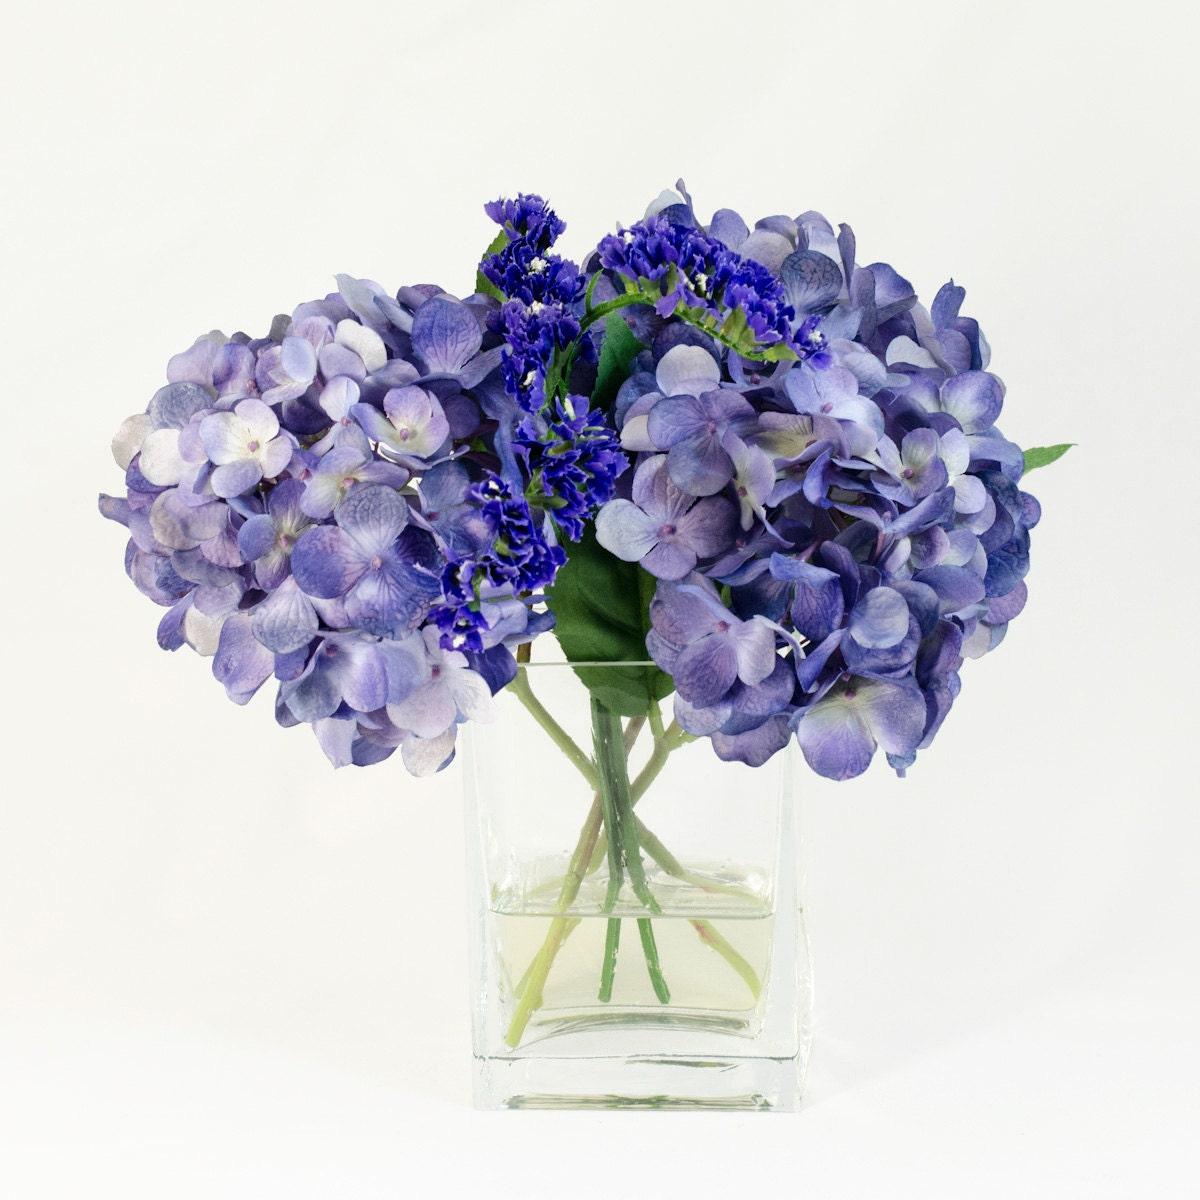 Purple Hydrangea Arrangement Silk Flowers Greenery Spray